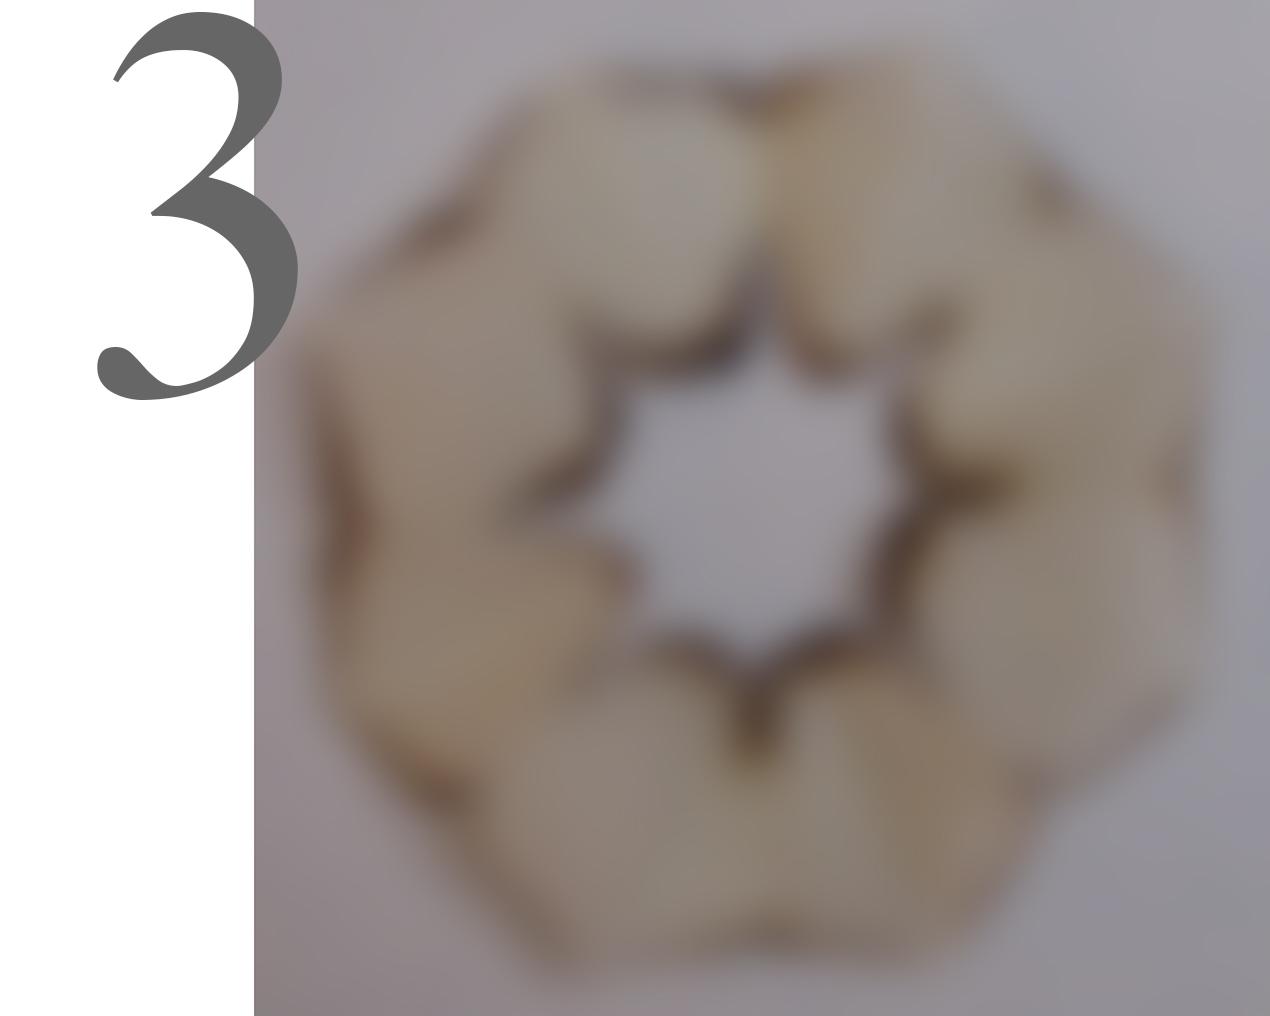 image of burnt snowflake